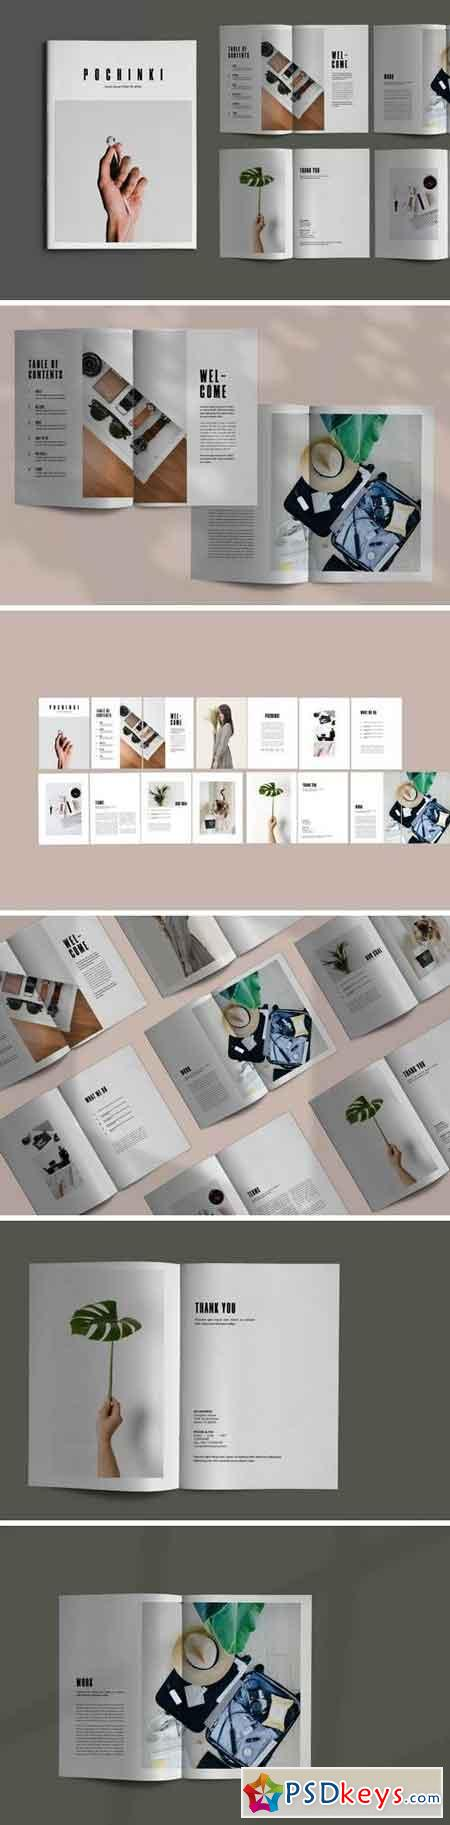 Pochinky - Brochure Template